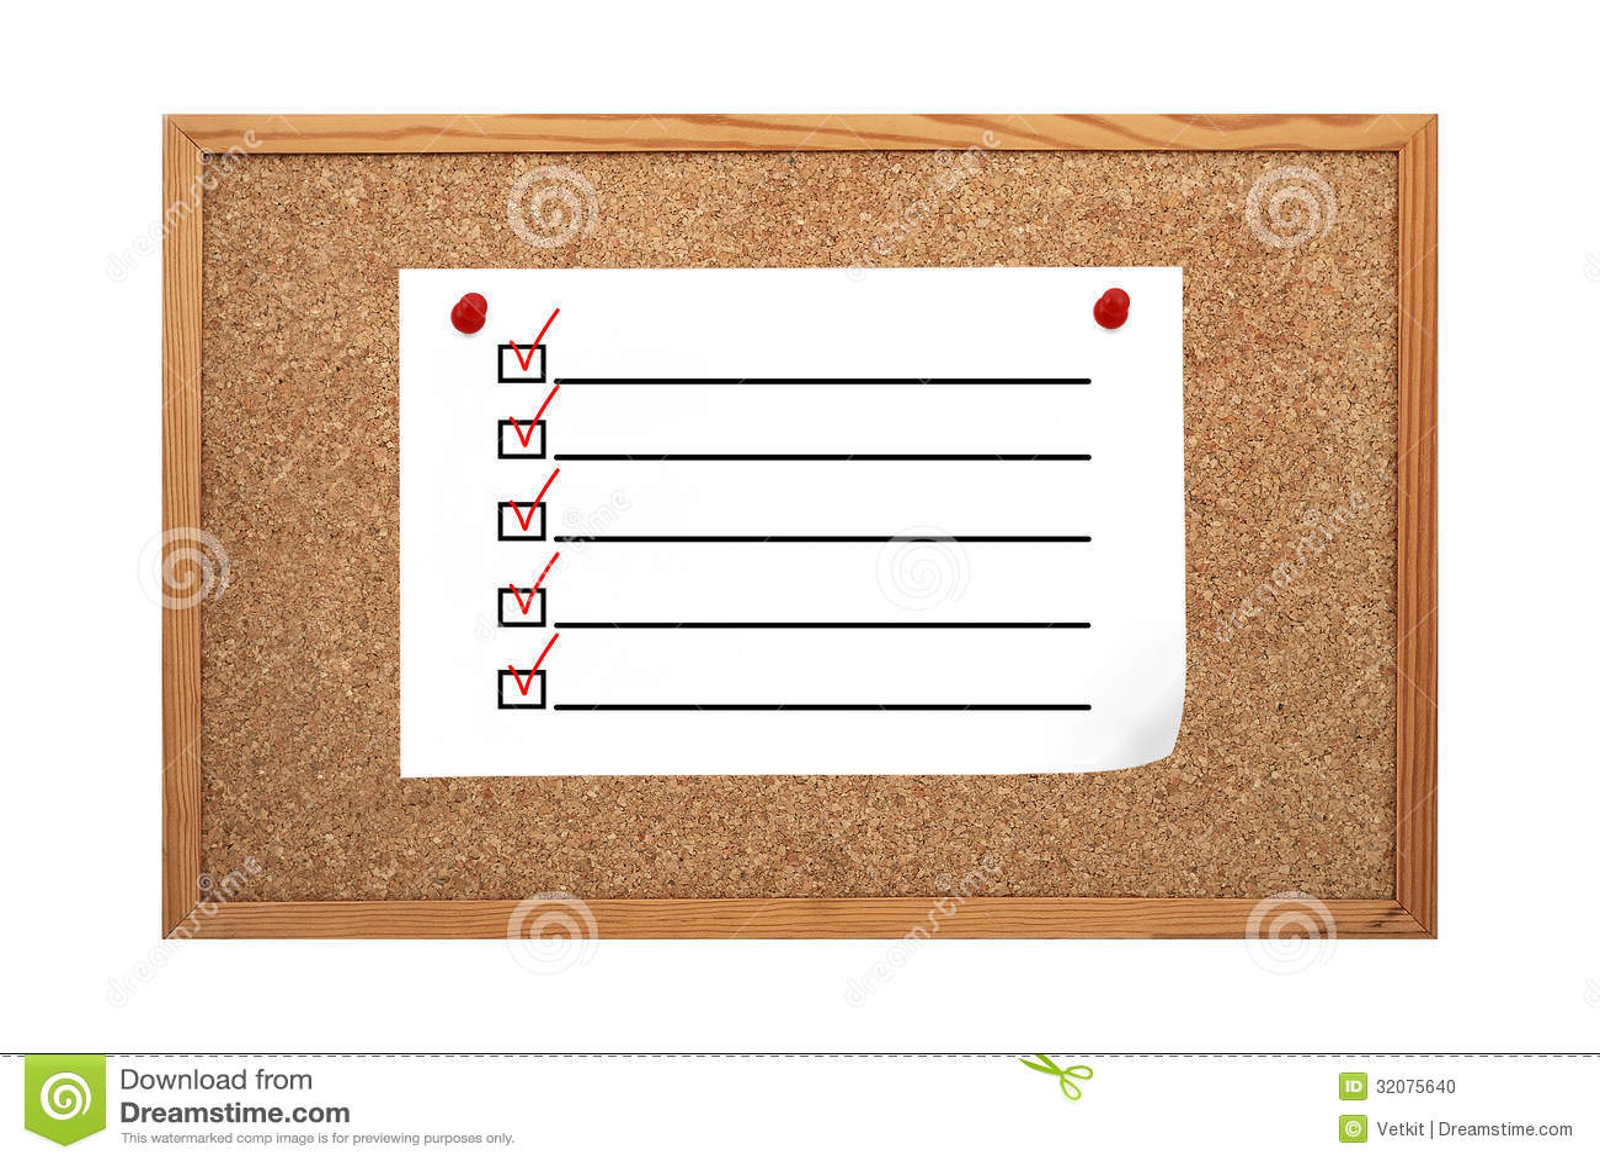 paper checkbox